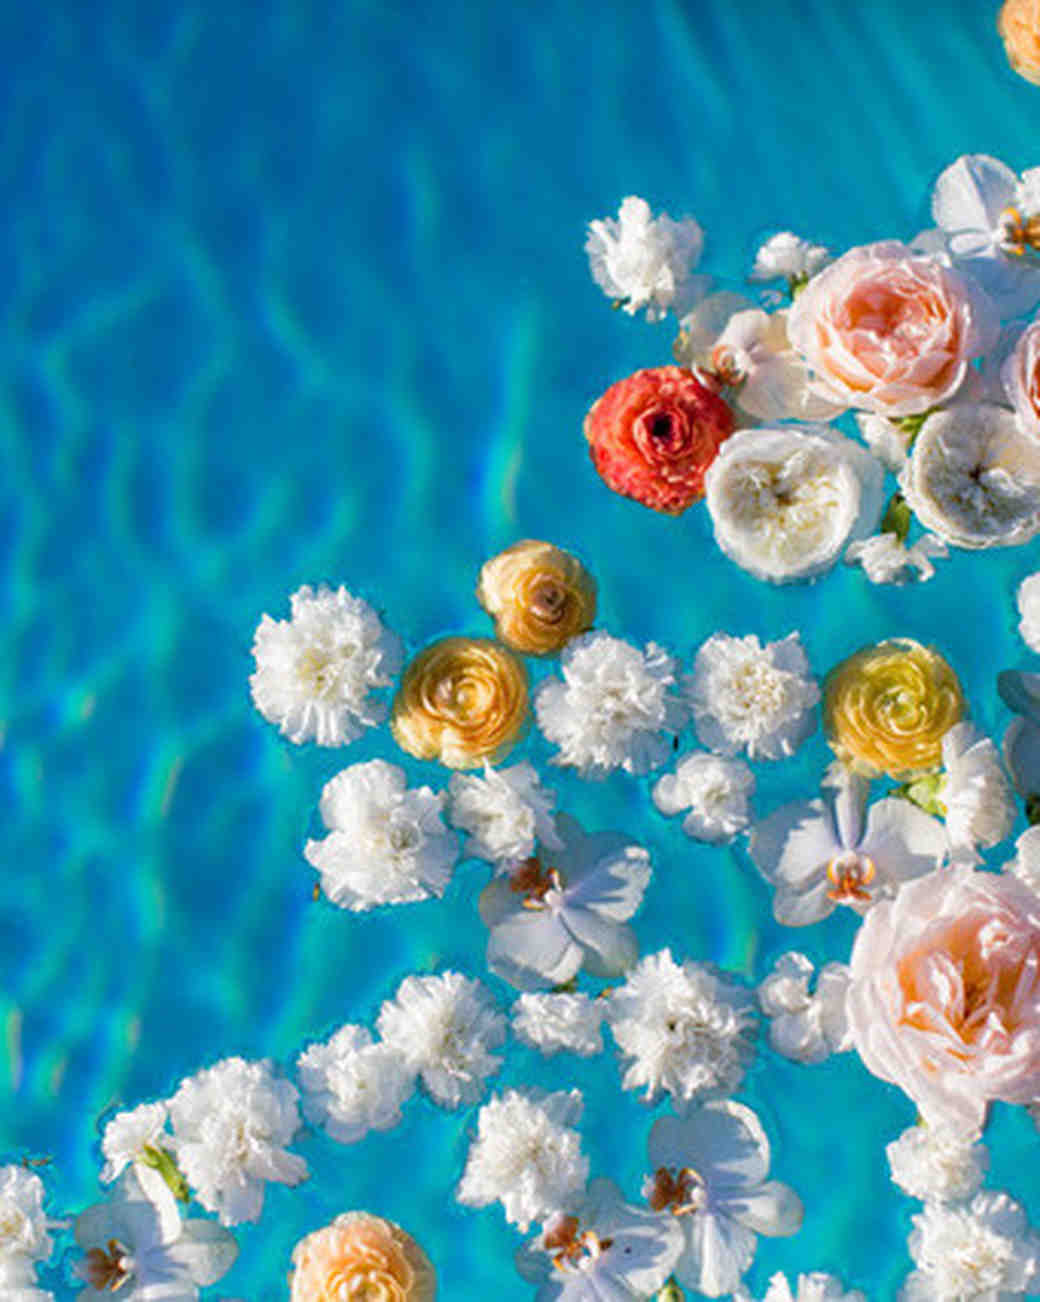 Flower Petals in a Pool